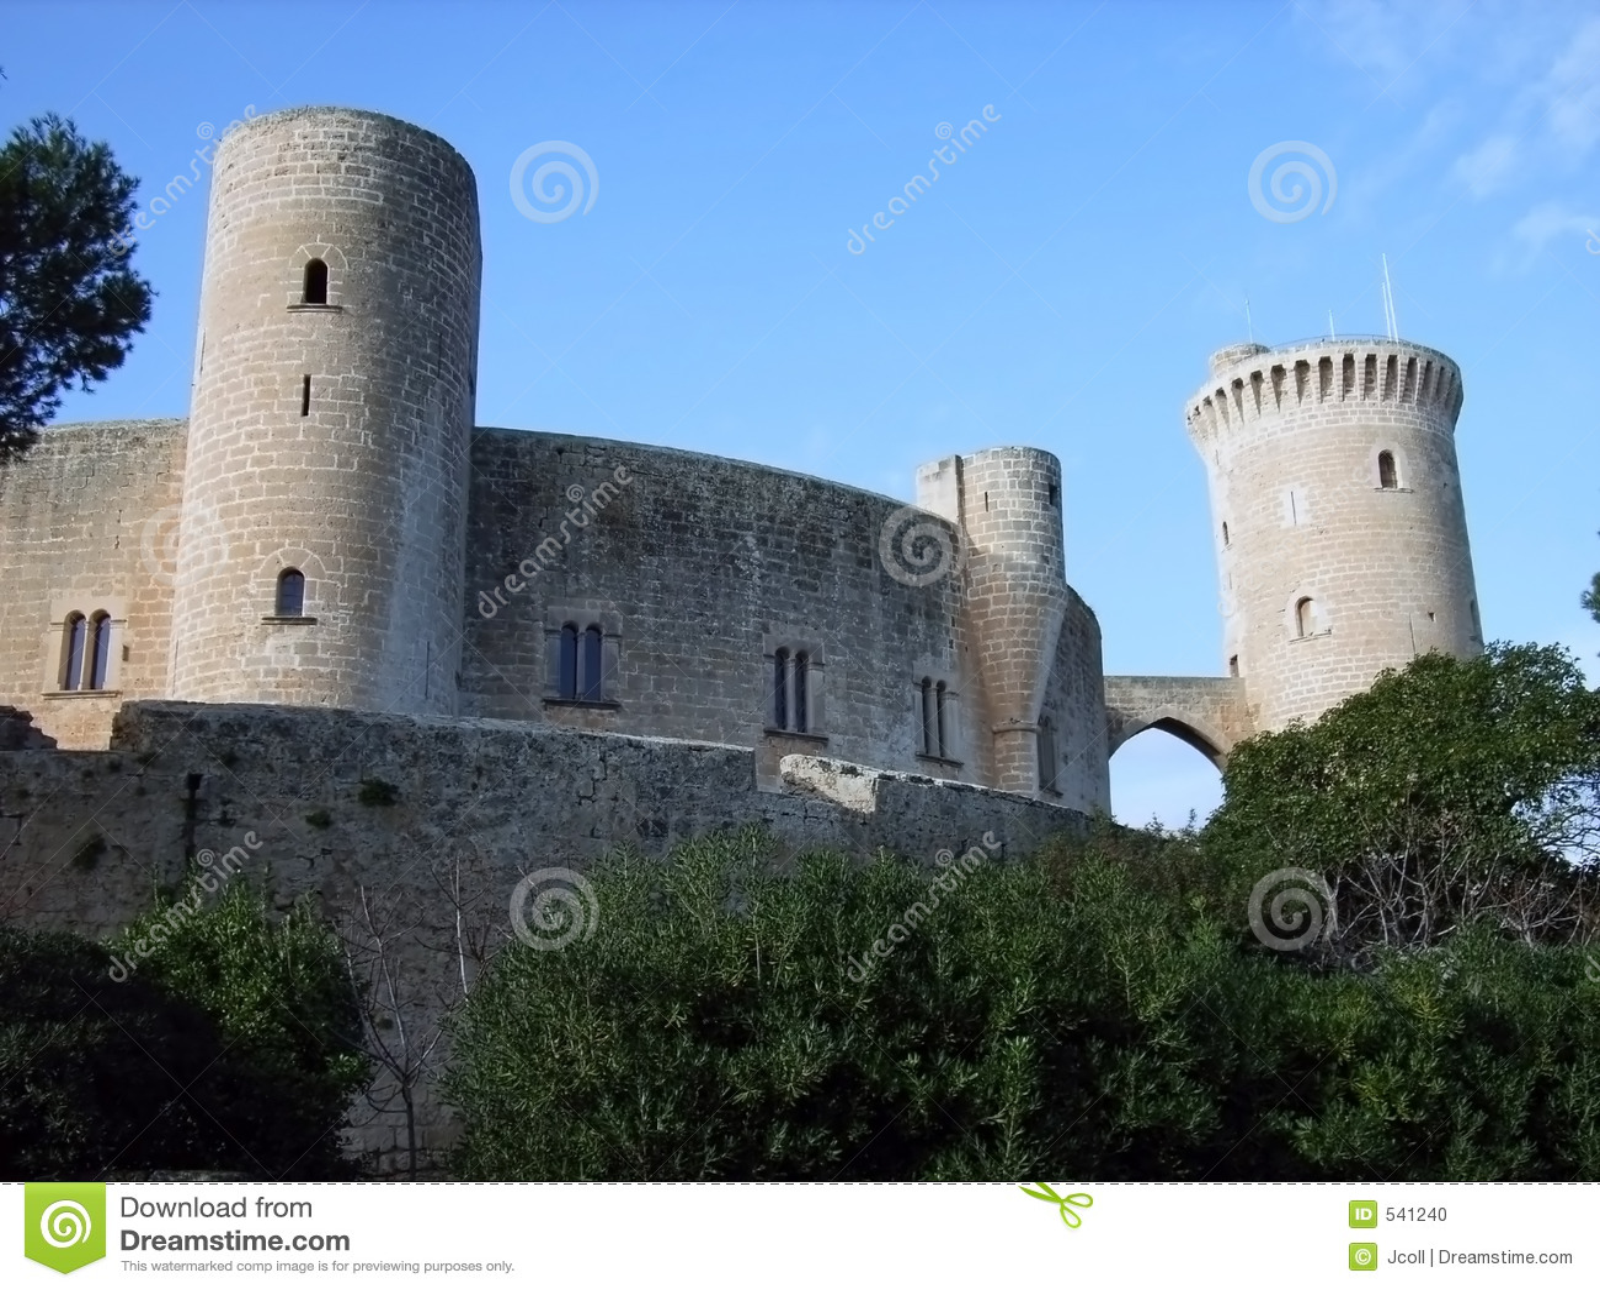 Download 4 bellver城堡 库存照片. 图片 包括有 墙壁, 监狱, majorca, 中世纪, 城堡, 西班牙 - 541240